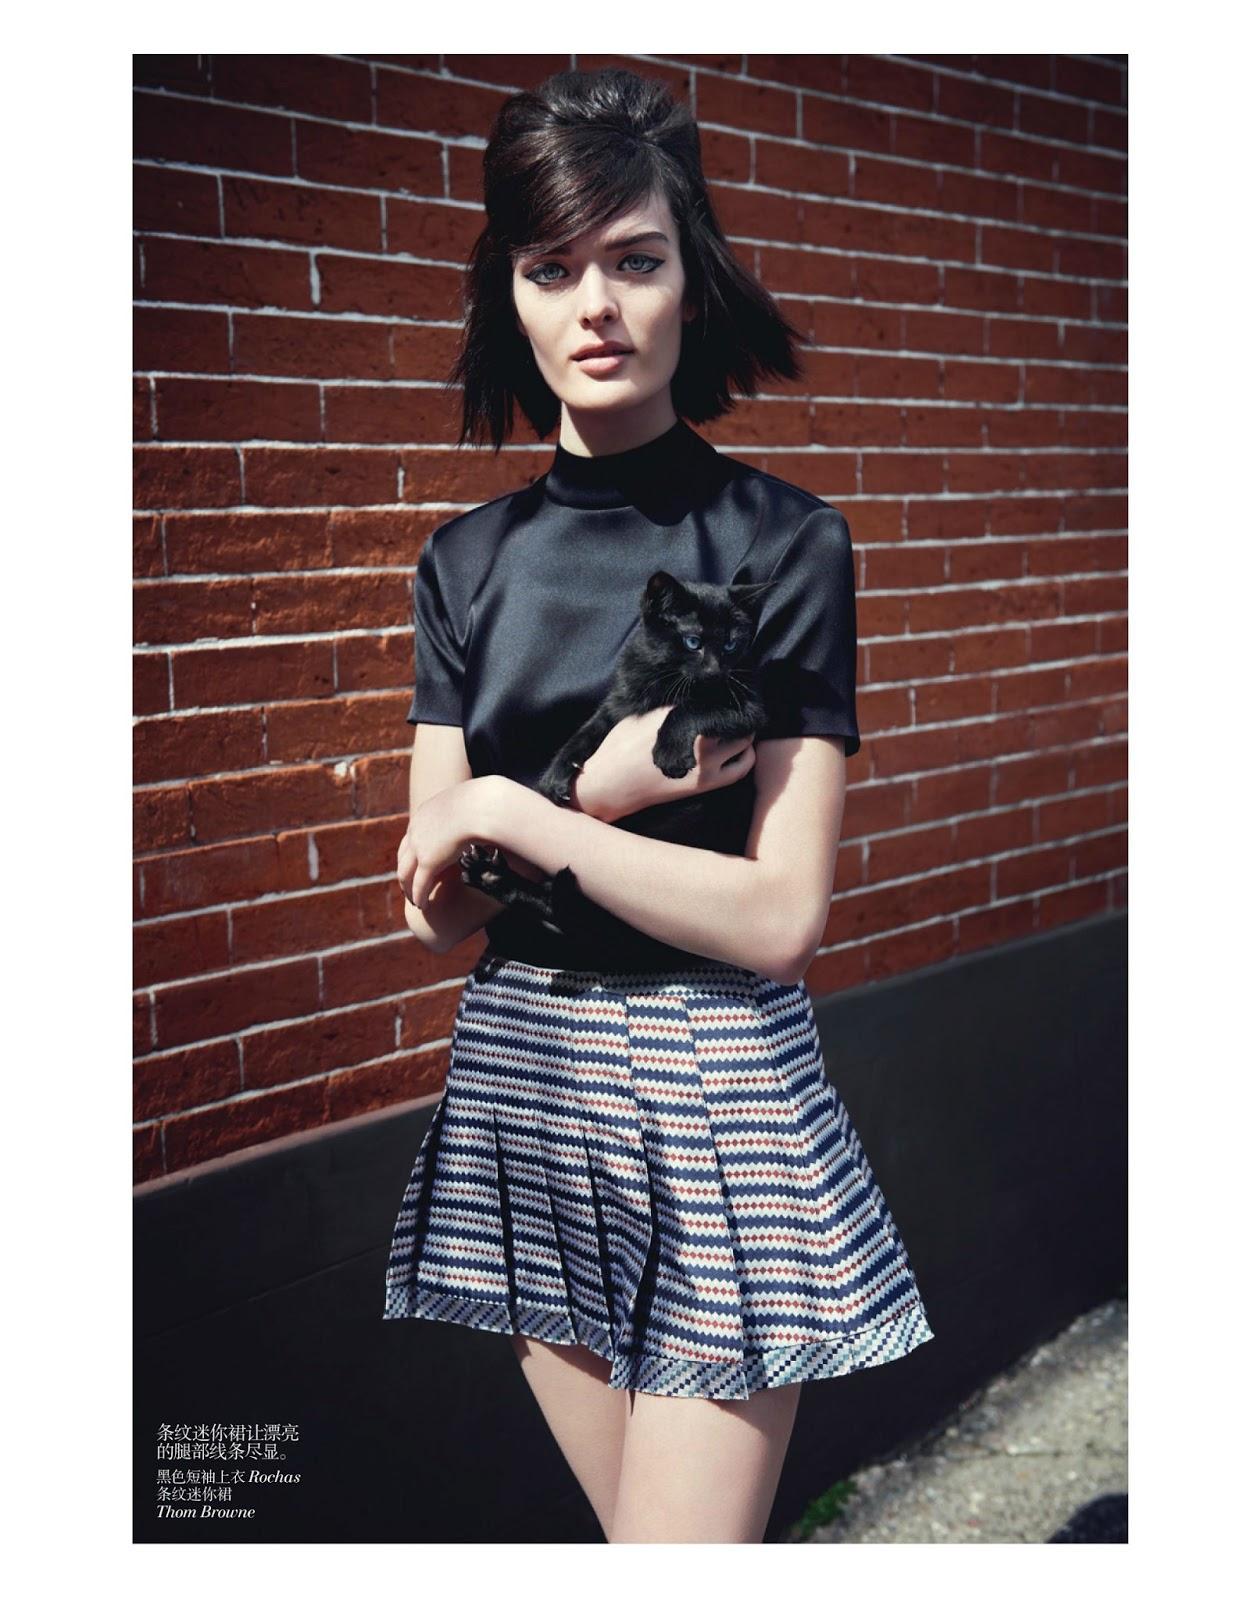 (Digital) Vogue6543 China June 2013 (8)